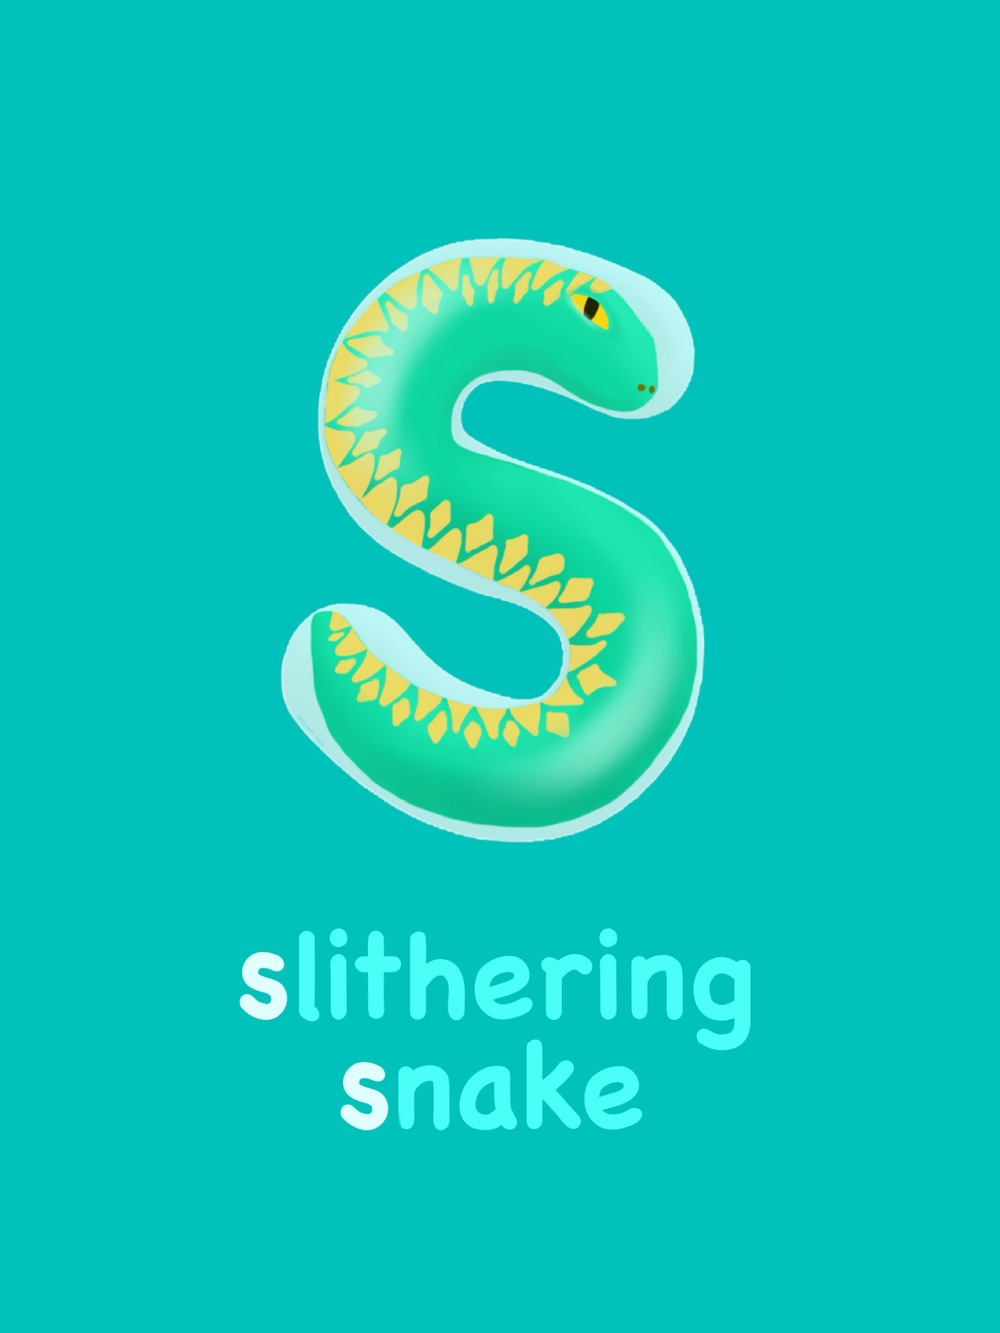 Letter S - Slithering Snake